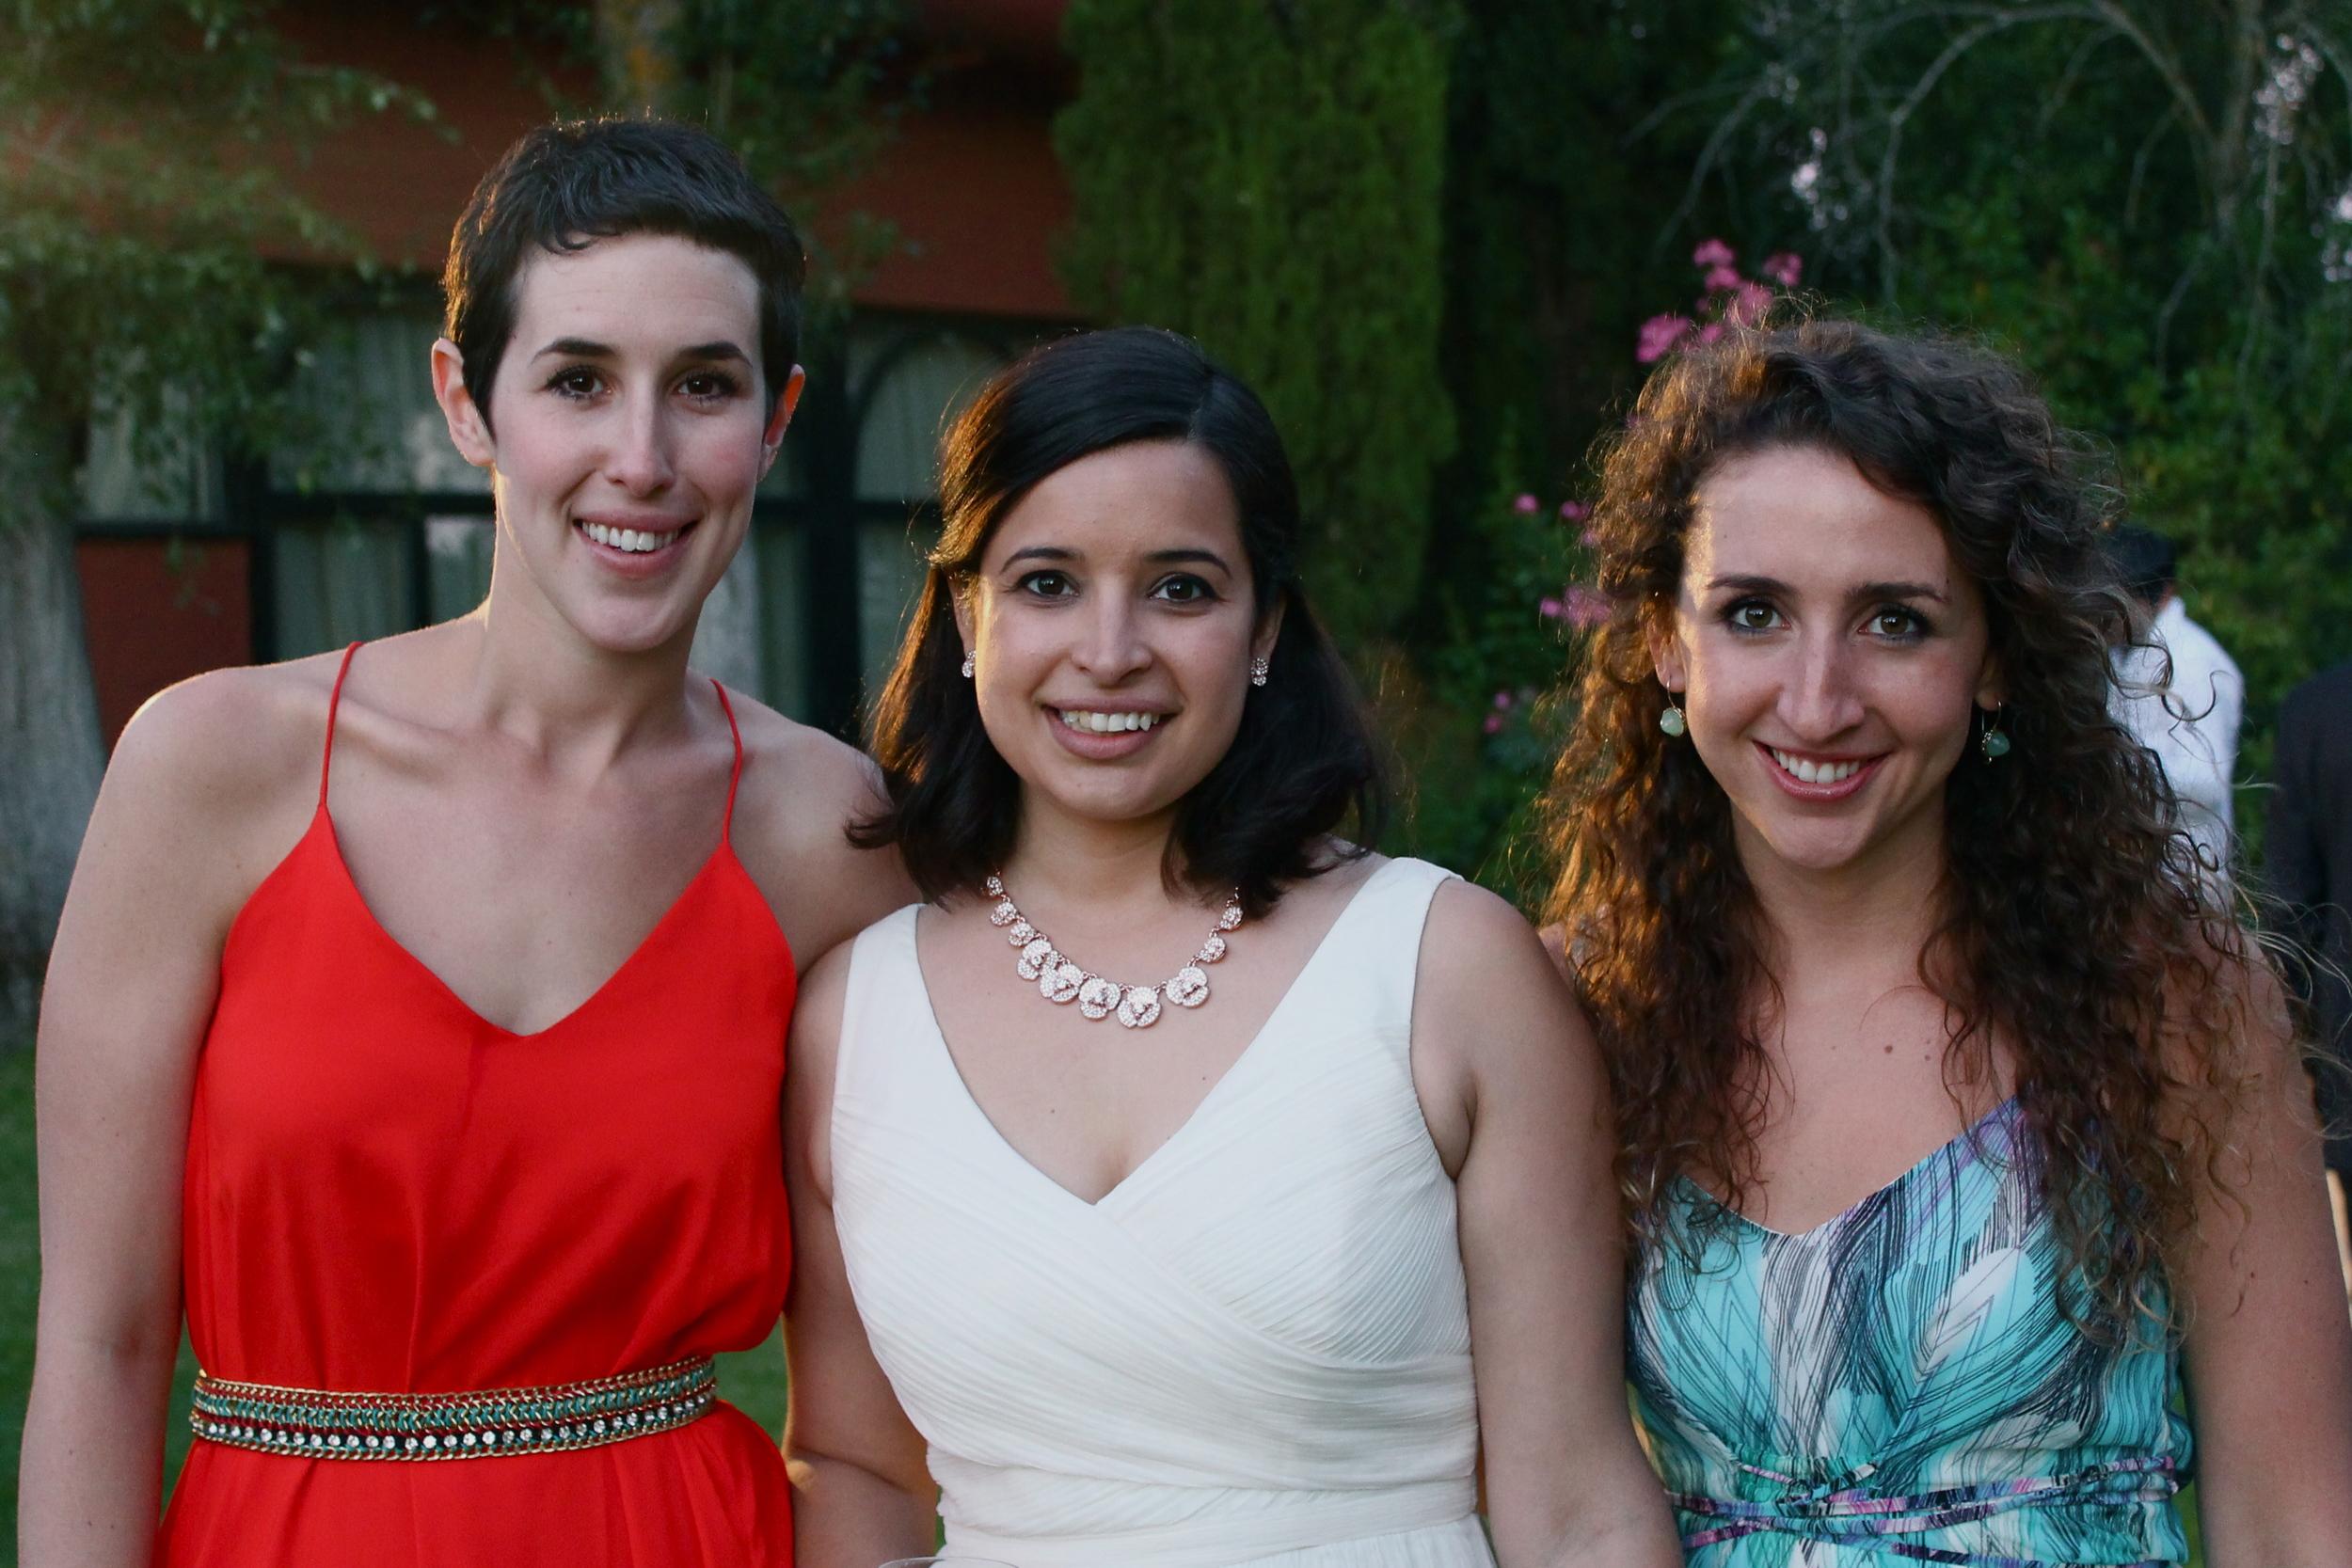 Jess, Anna and I